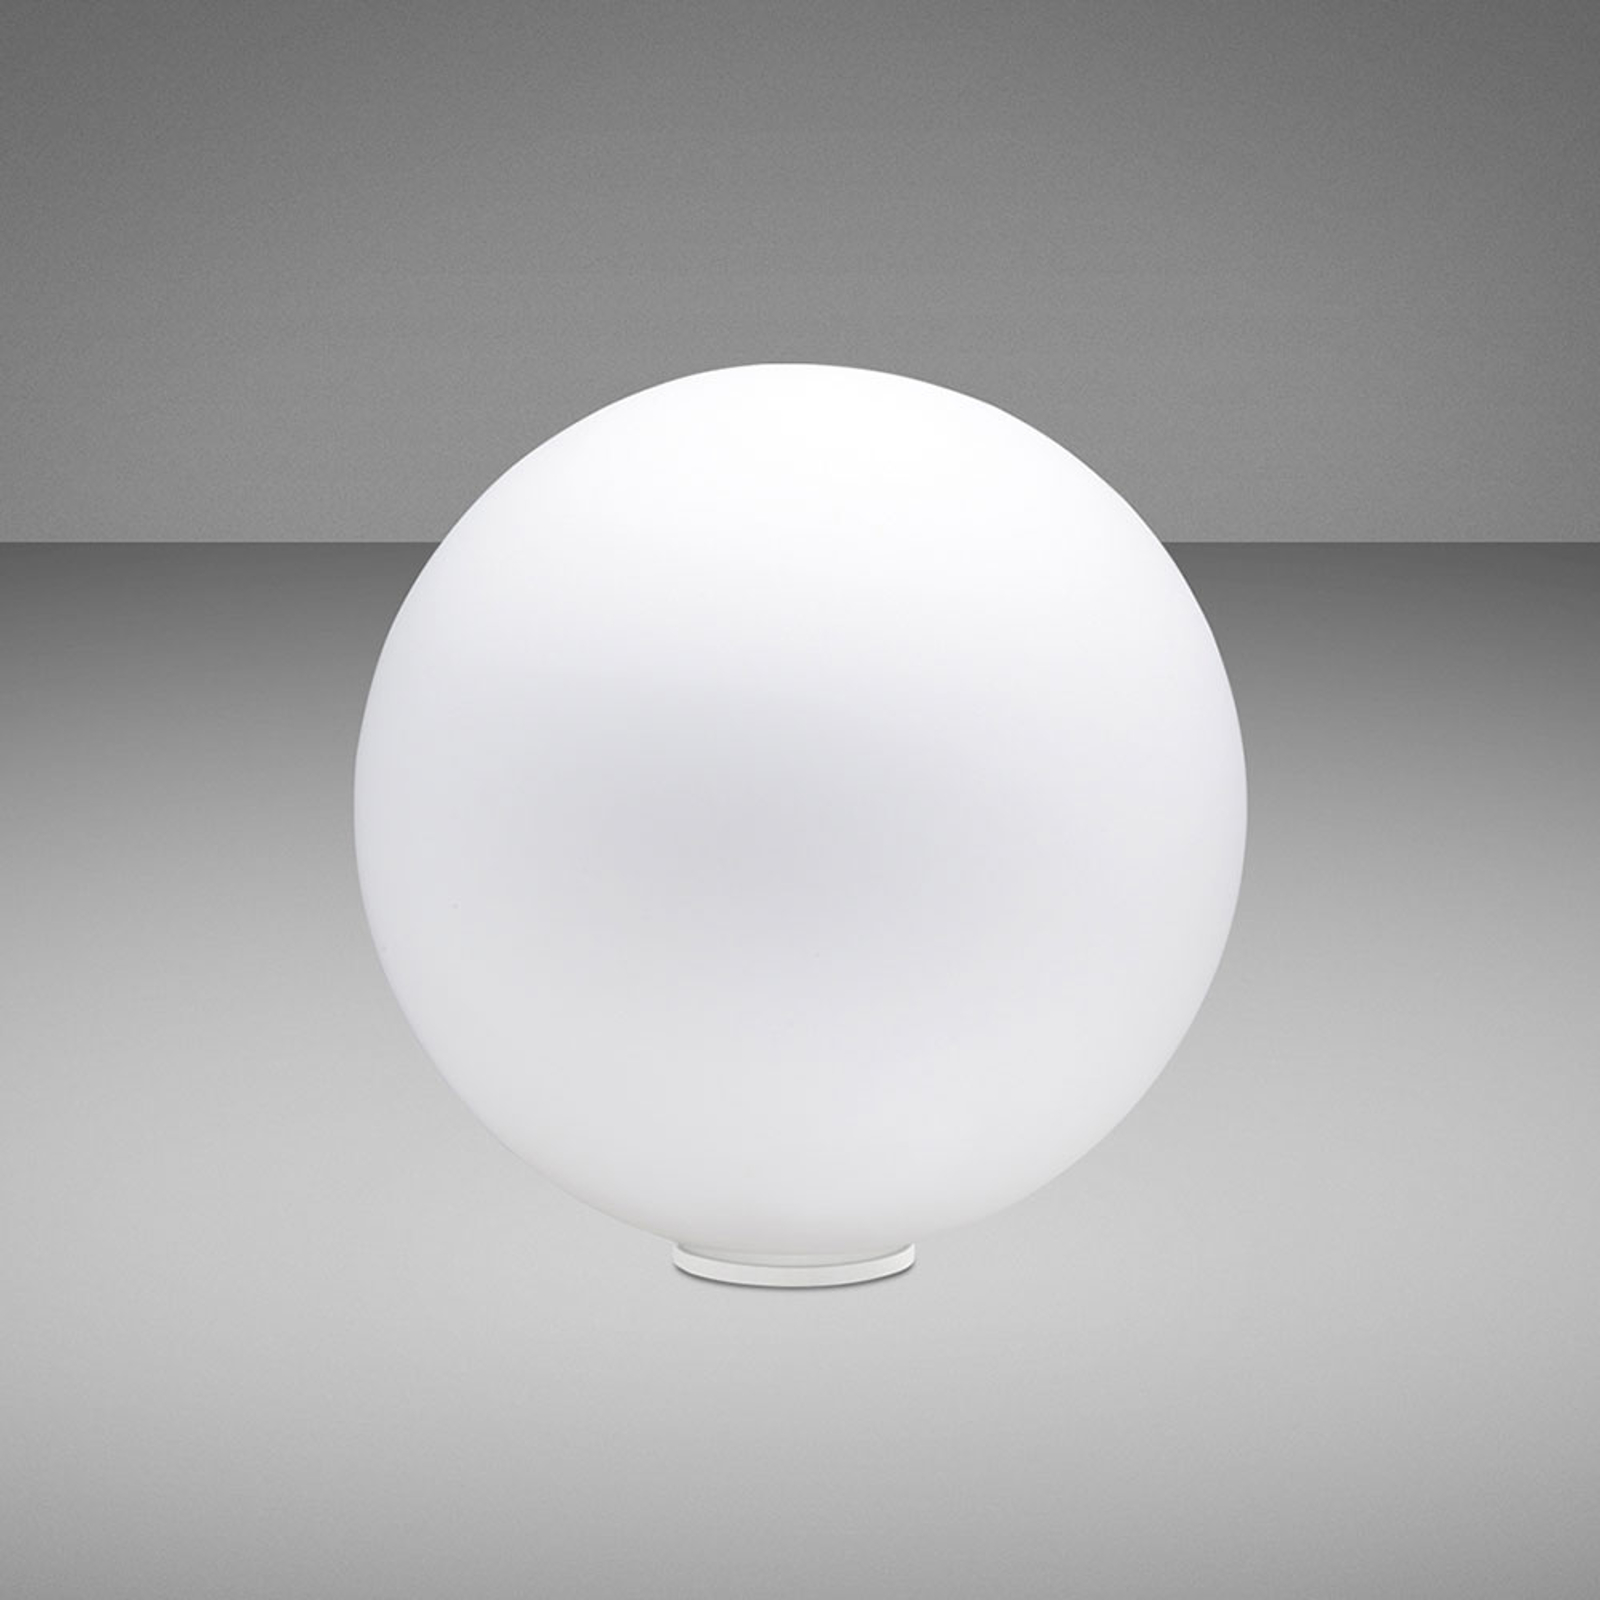 Fabbian Lumi Sfera bordlampe, liggende, Ø 20 cm